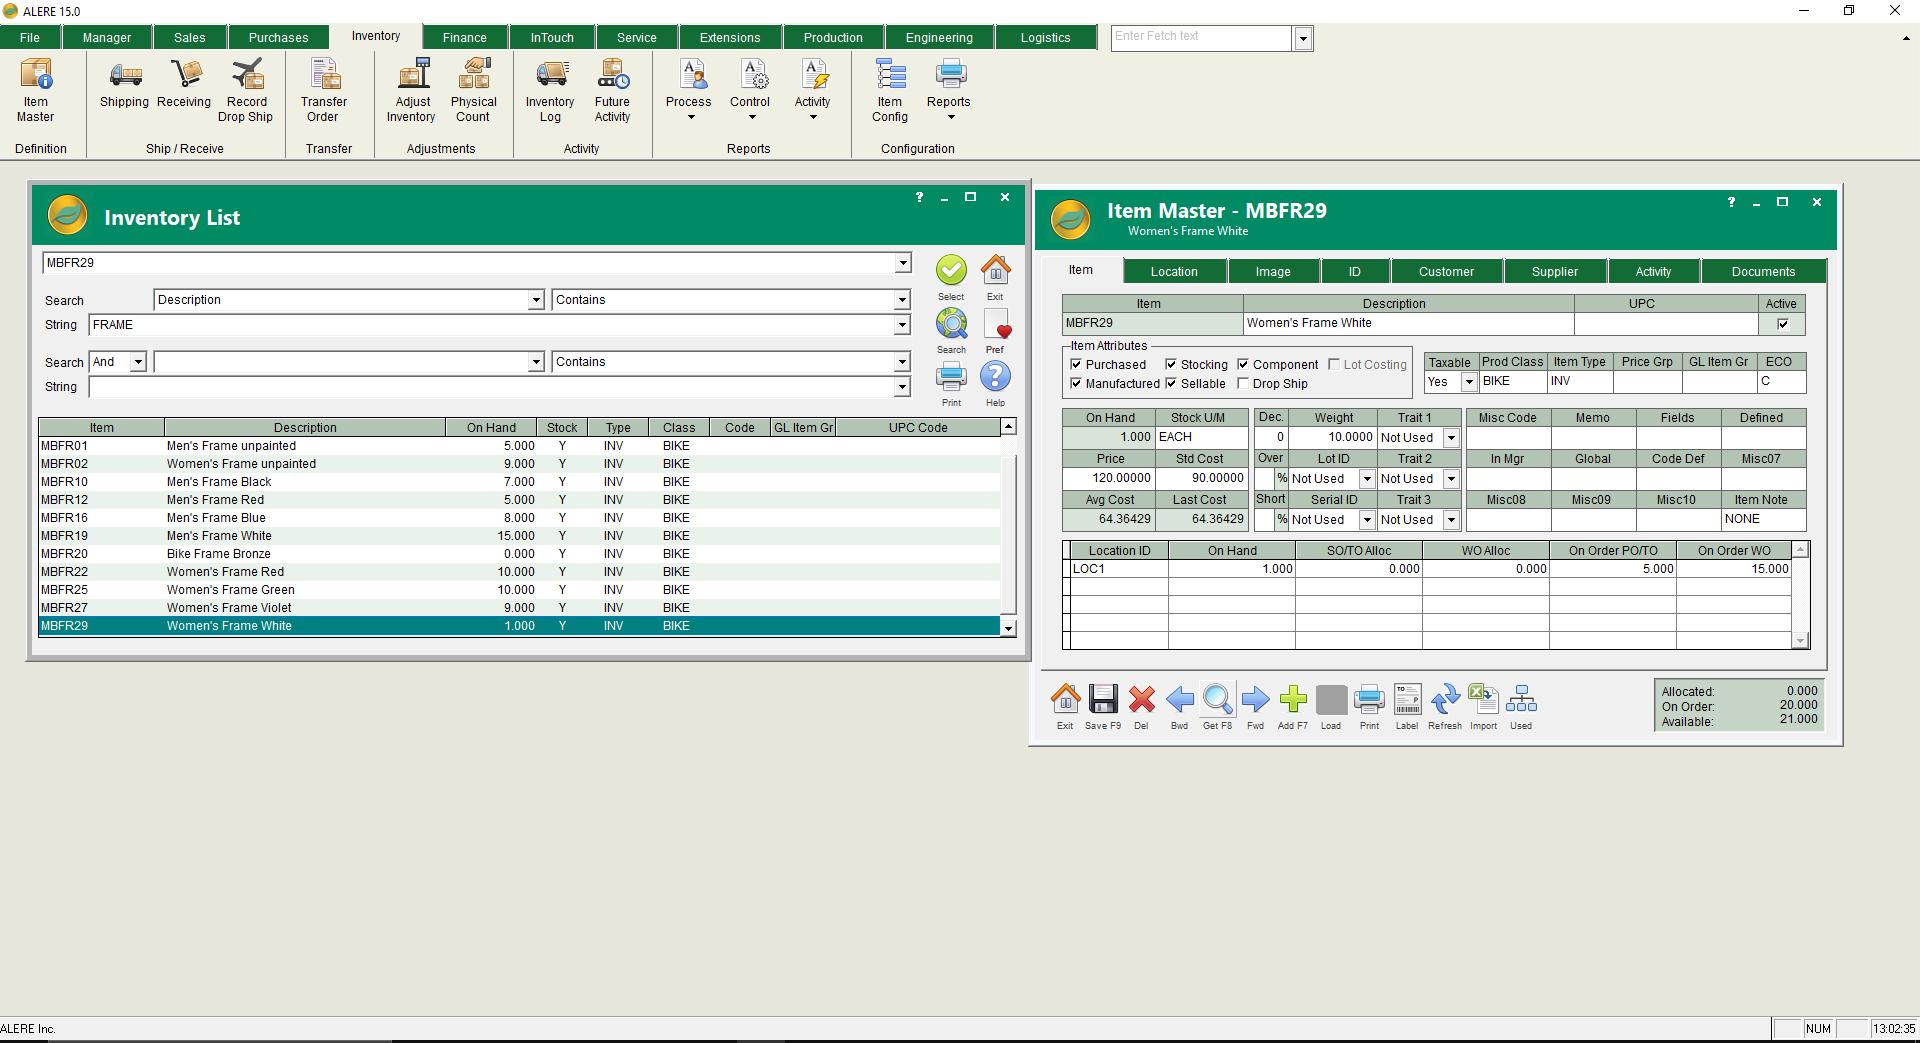 ALERE Inventory Management